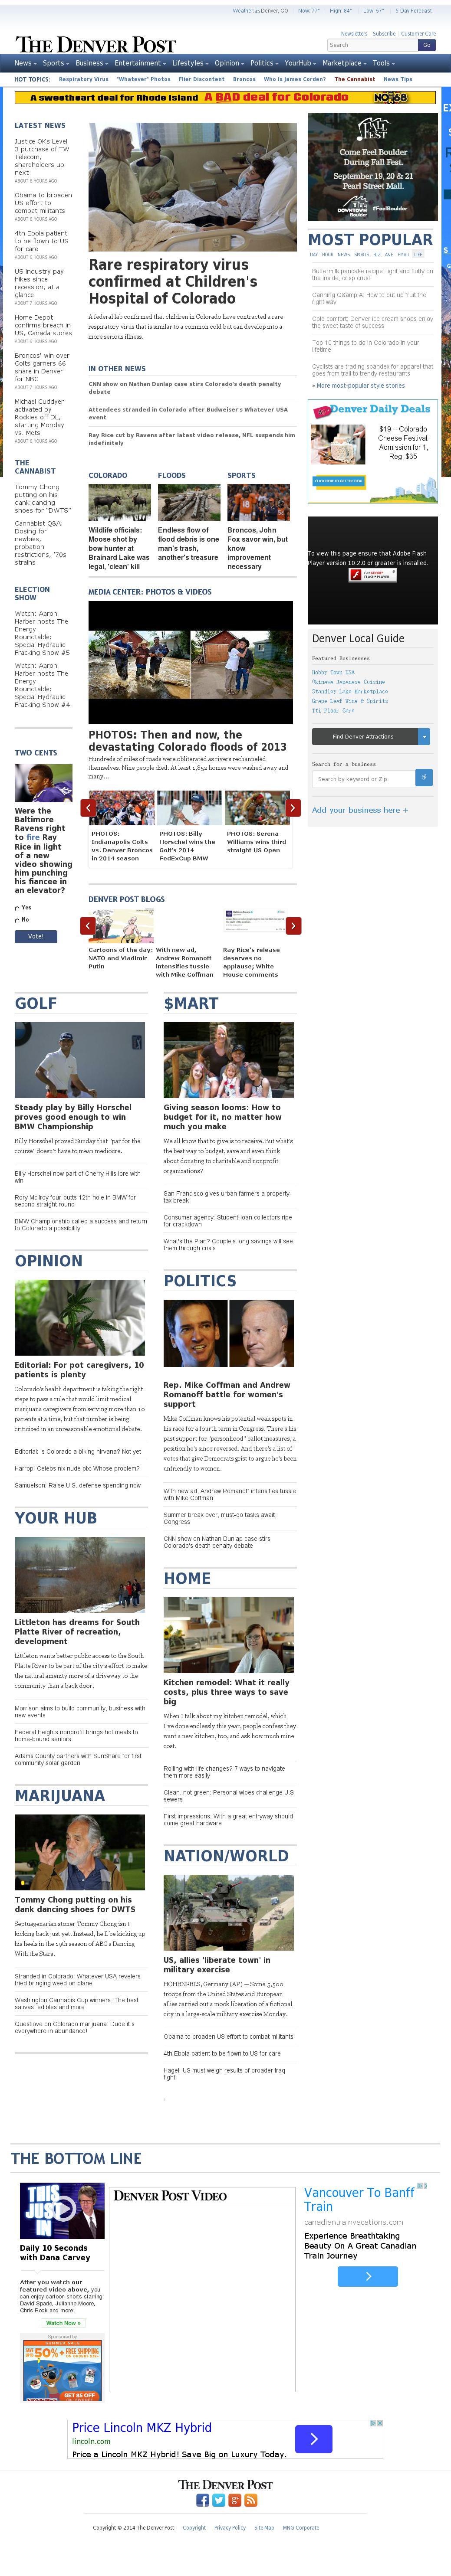 Denver Post at Monday Sept. 8, 2014, 10:06 p.m. UTC